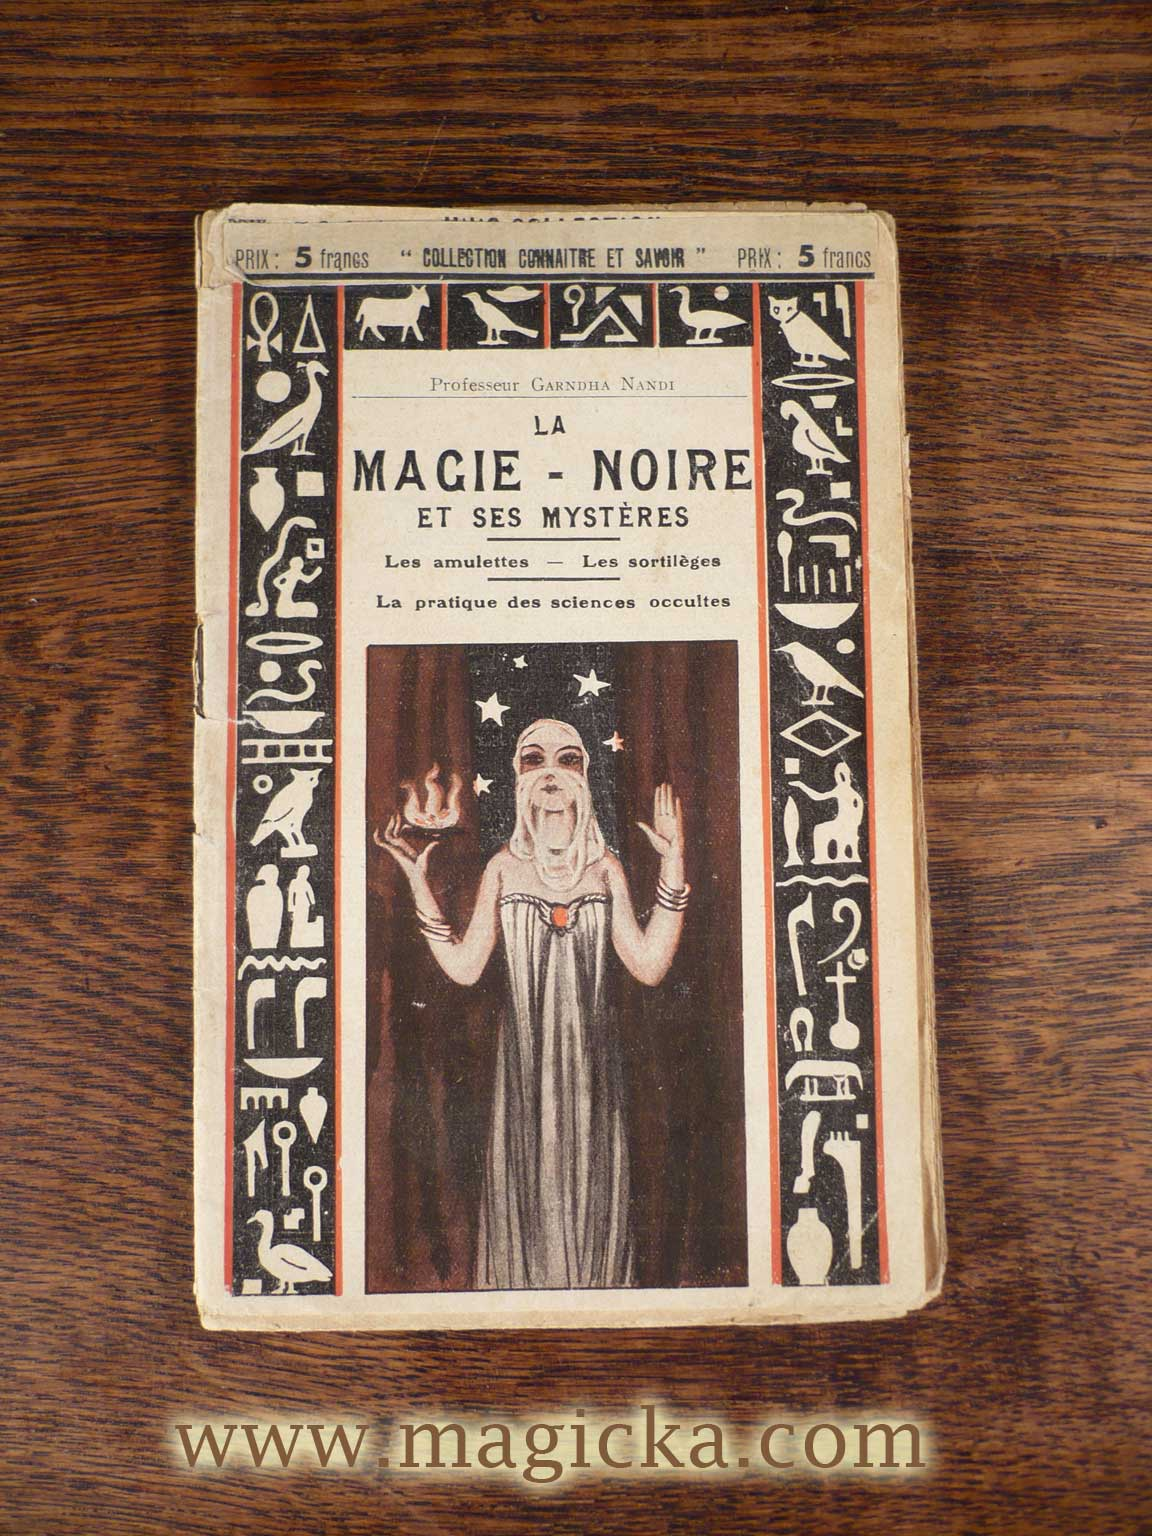 http://www.magicka.com/librairie-esoterique/magie-noire-mystere.jpg